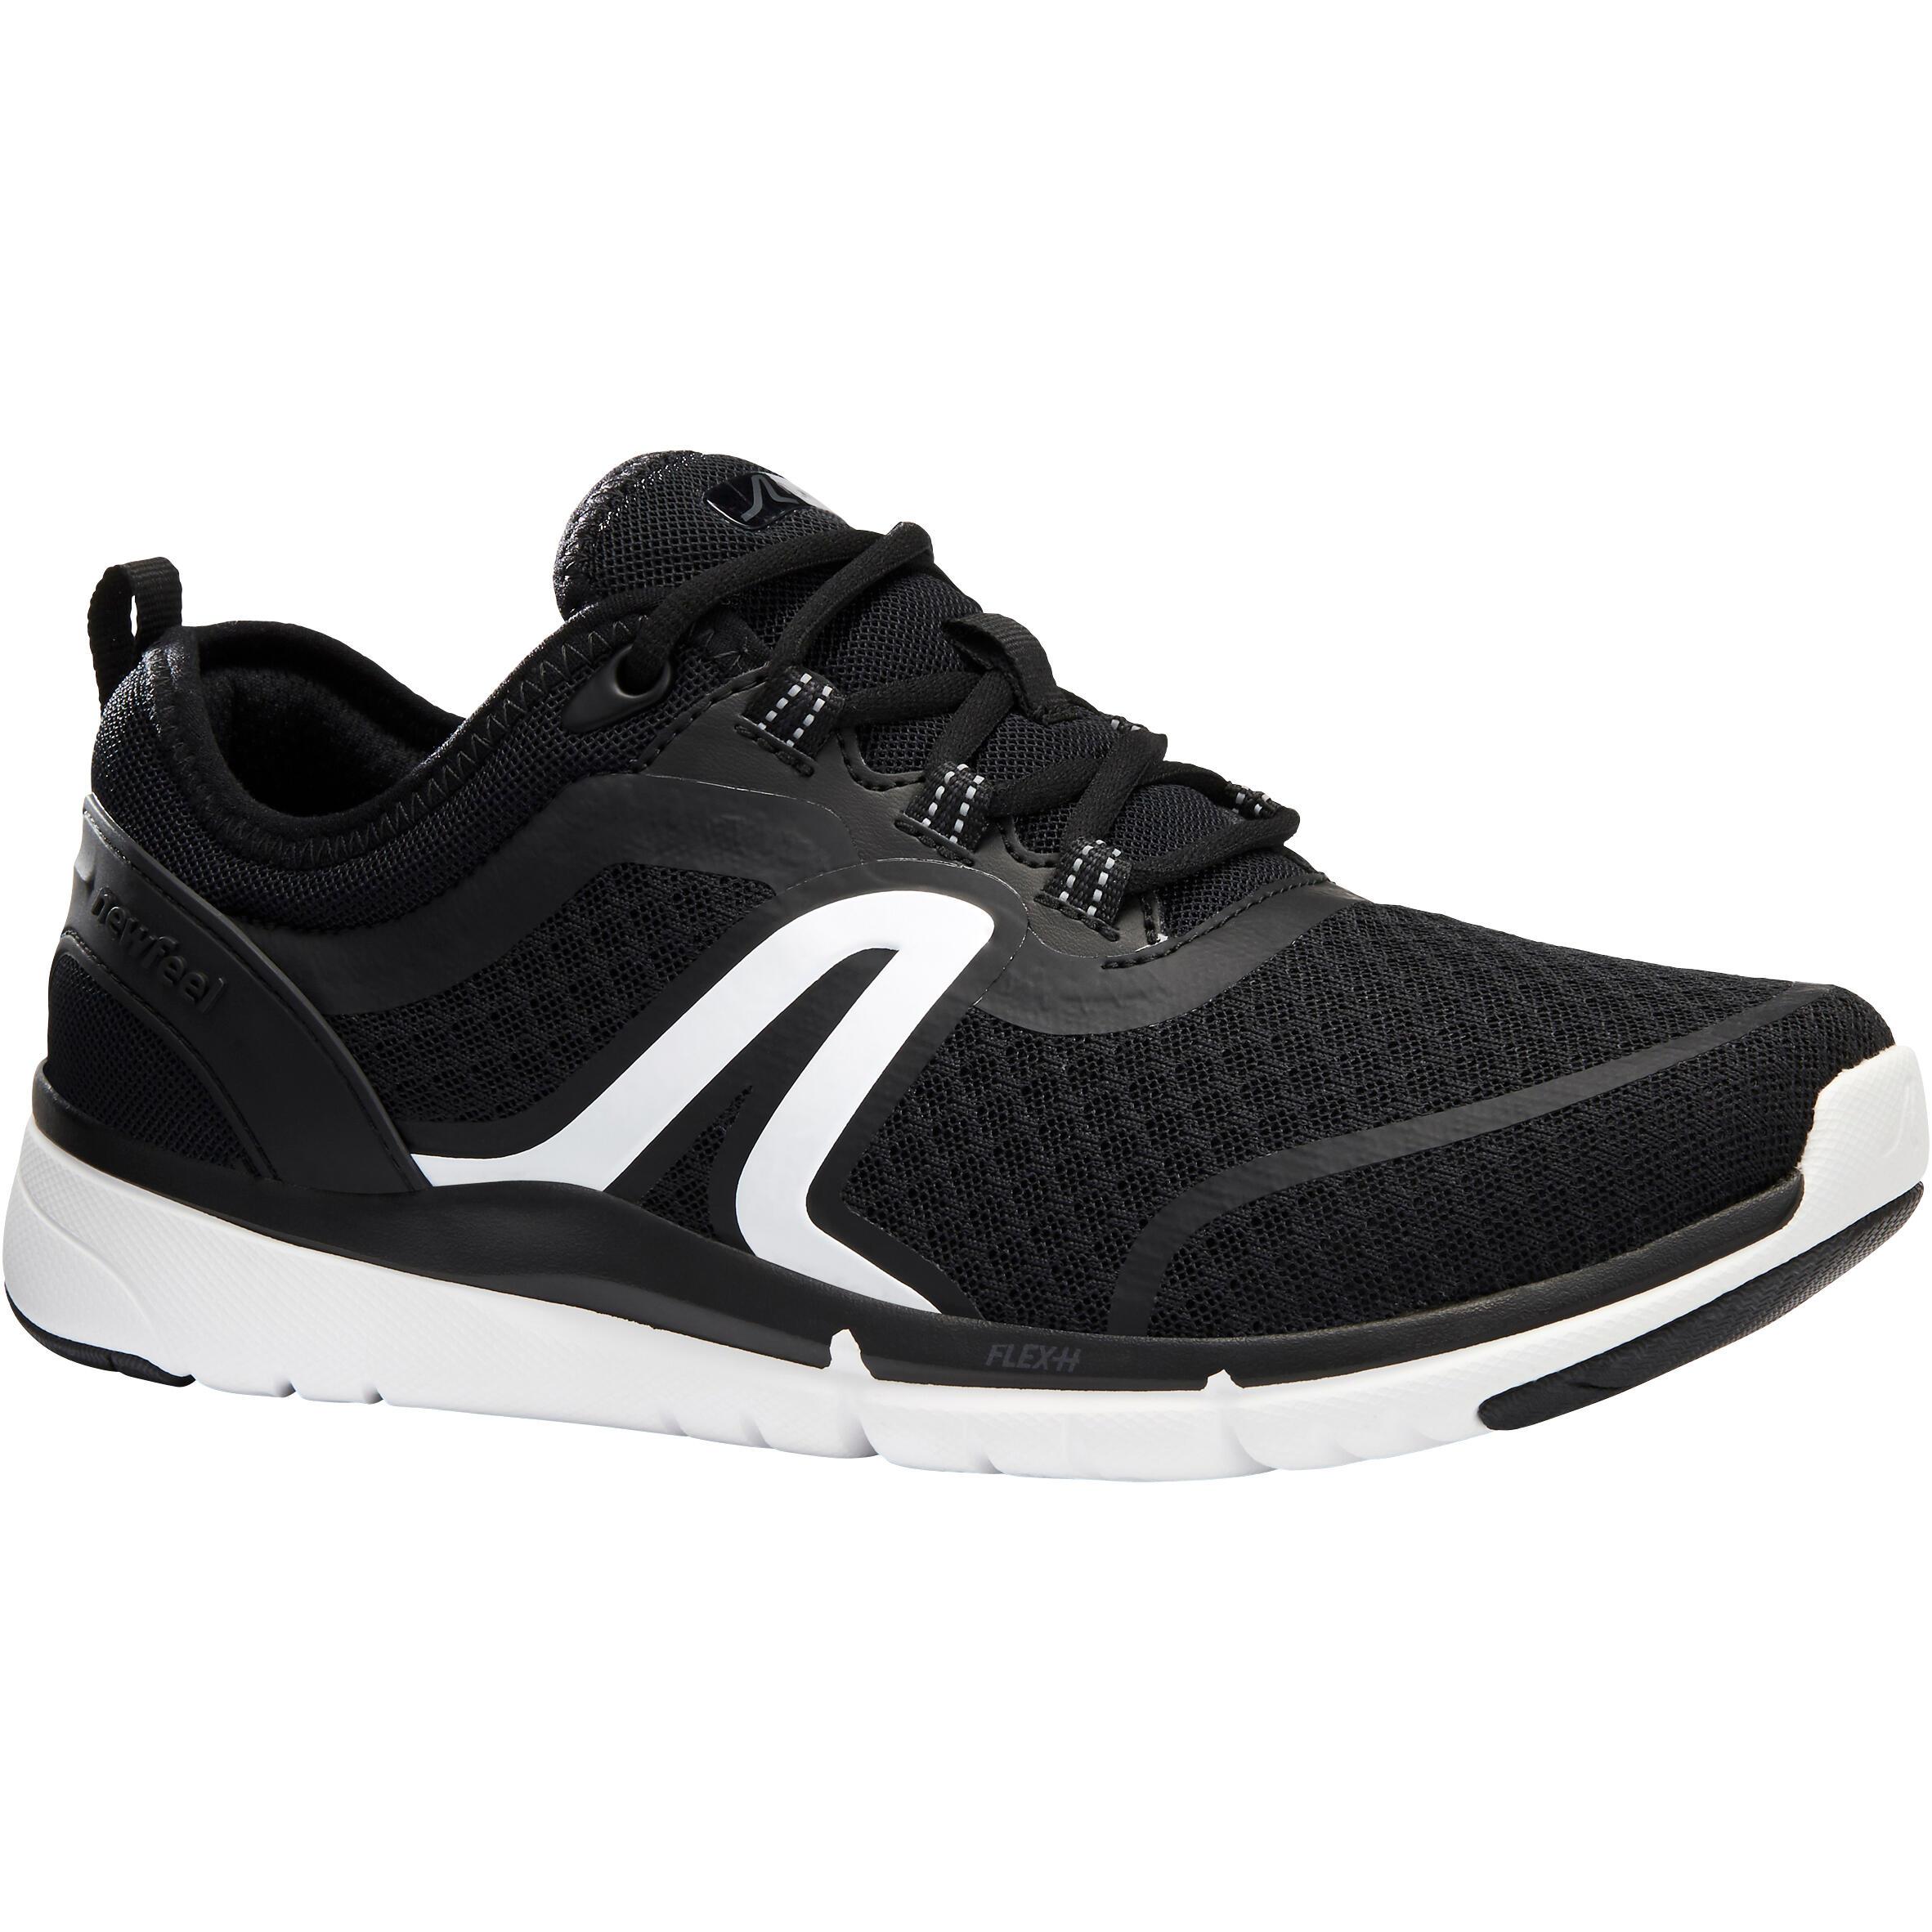 Tenis de caminata deportiva para mujer Soft 540 mesh negro / blanco